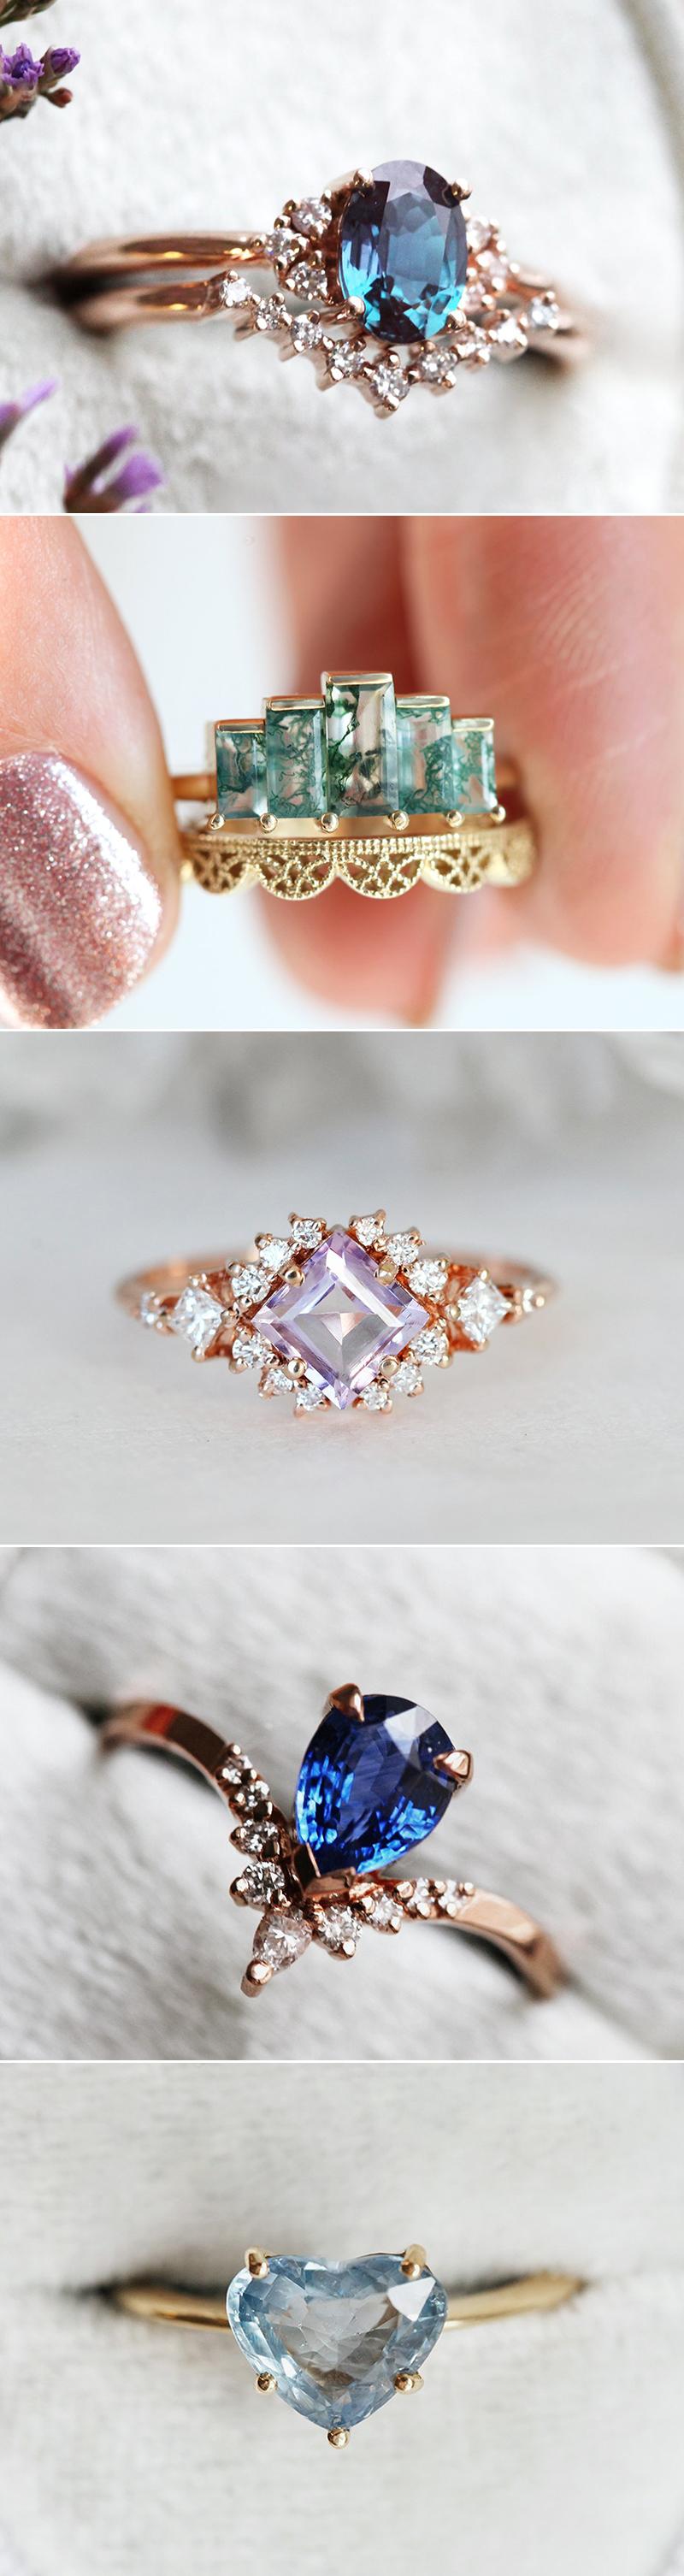 Engagement Rings Online